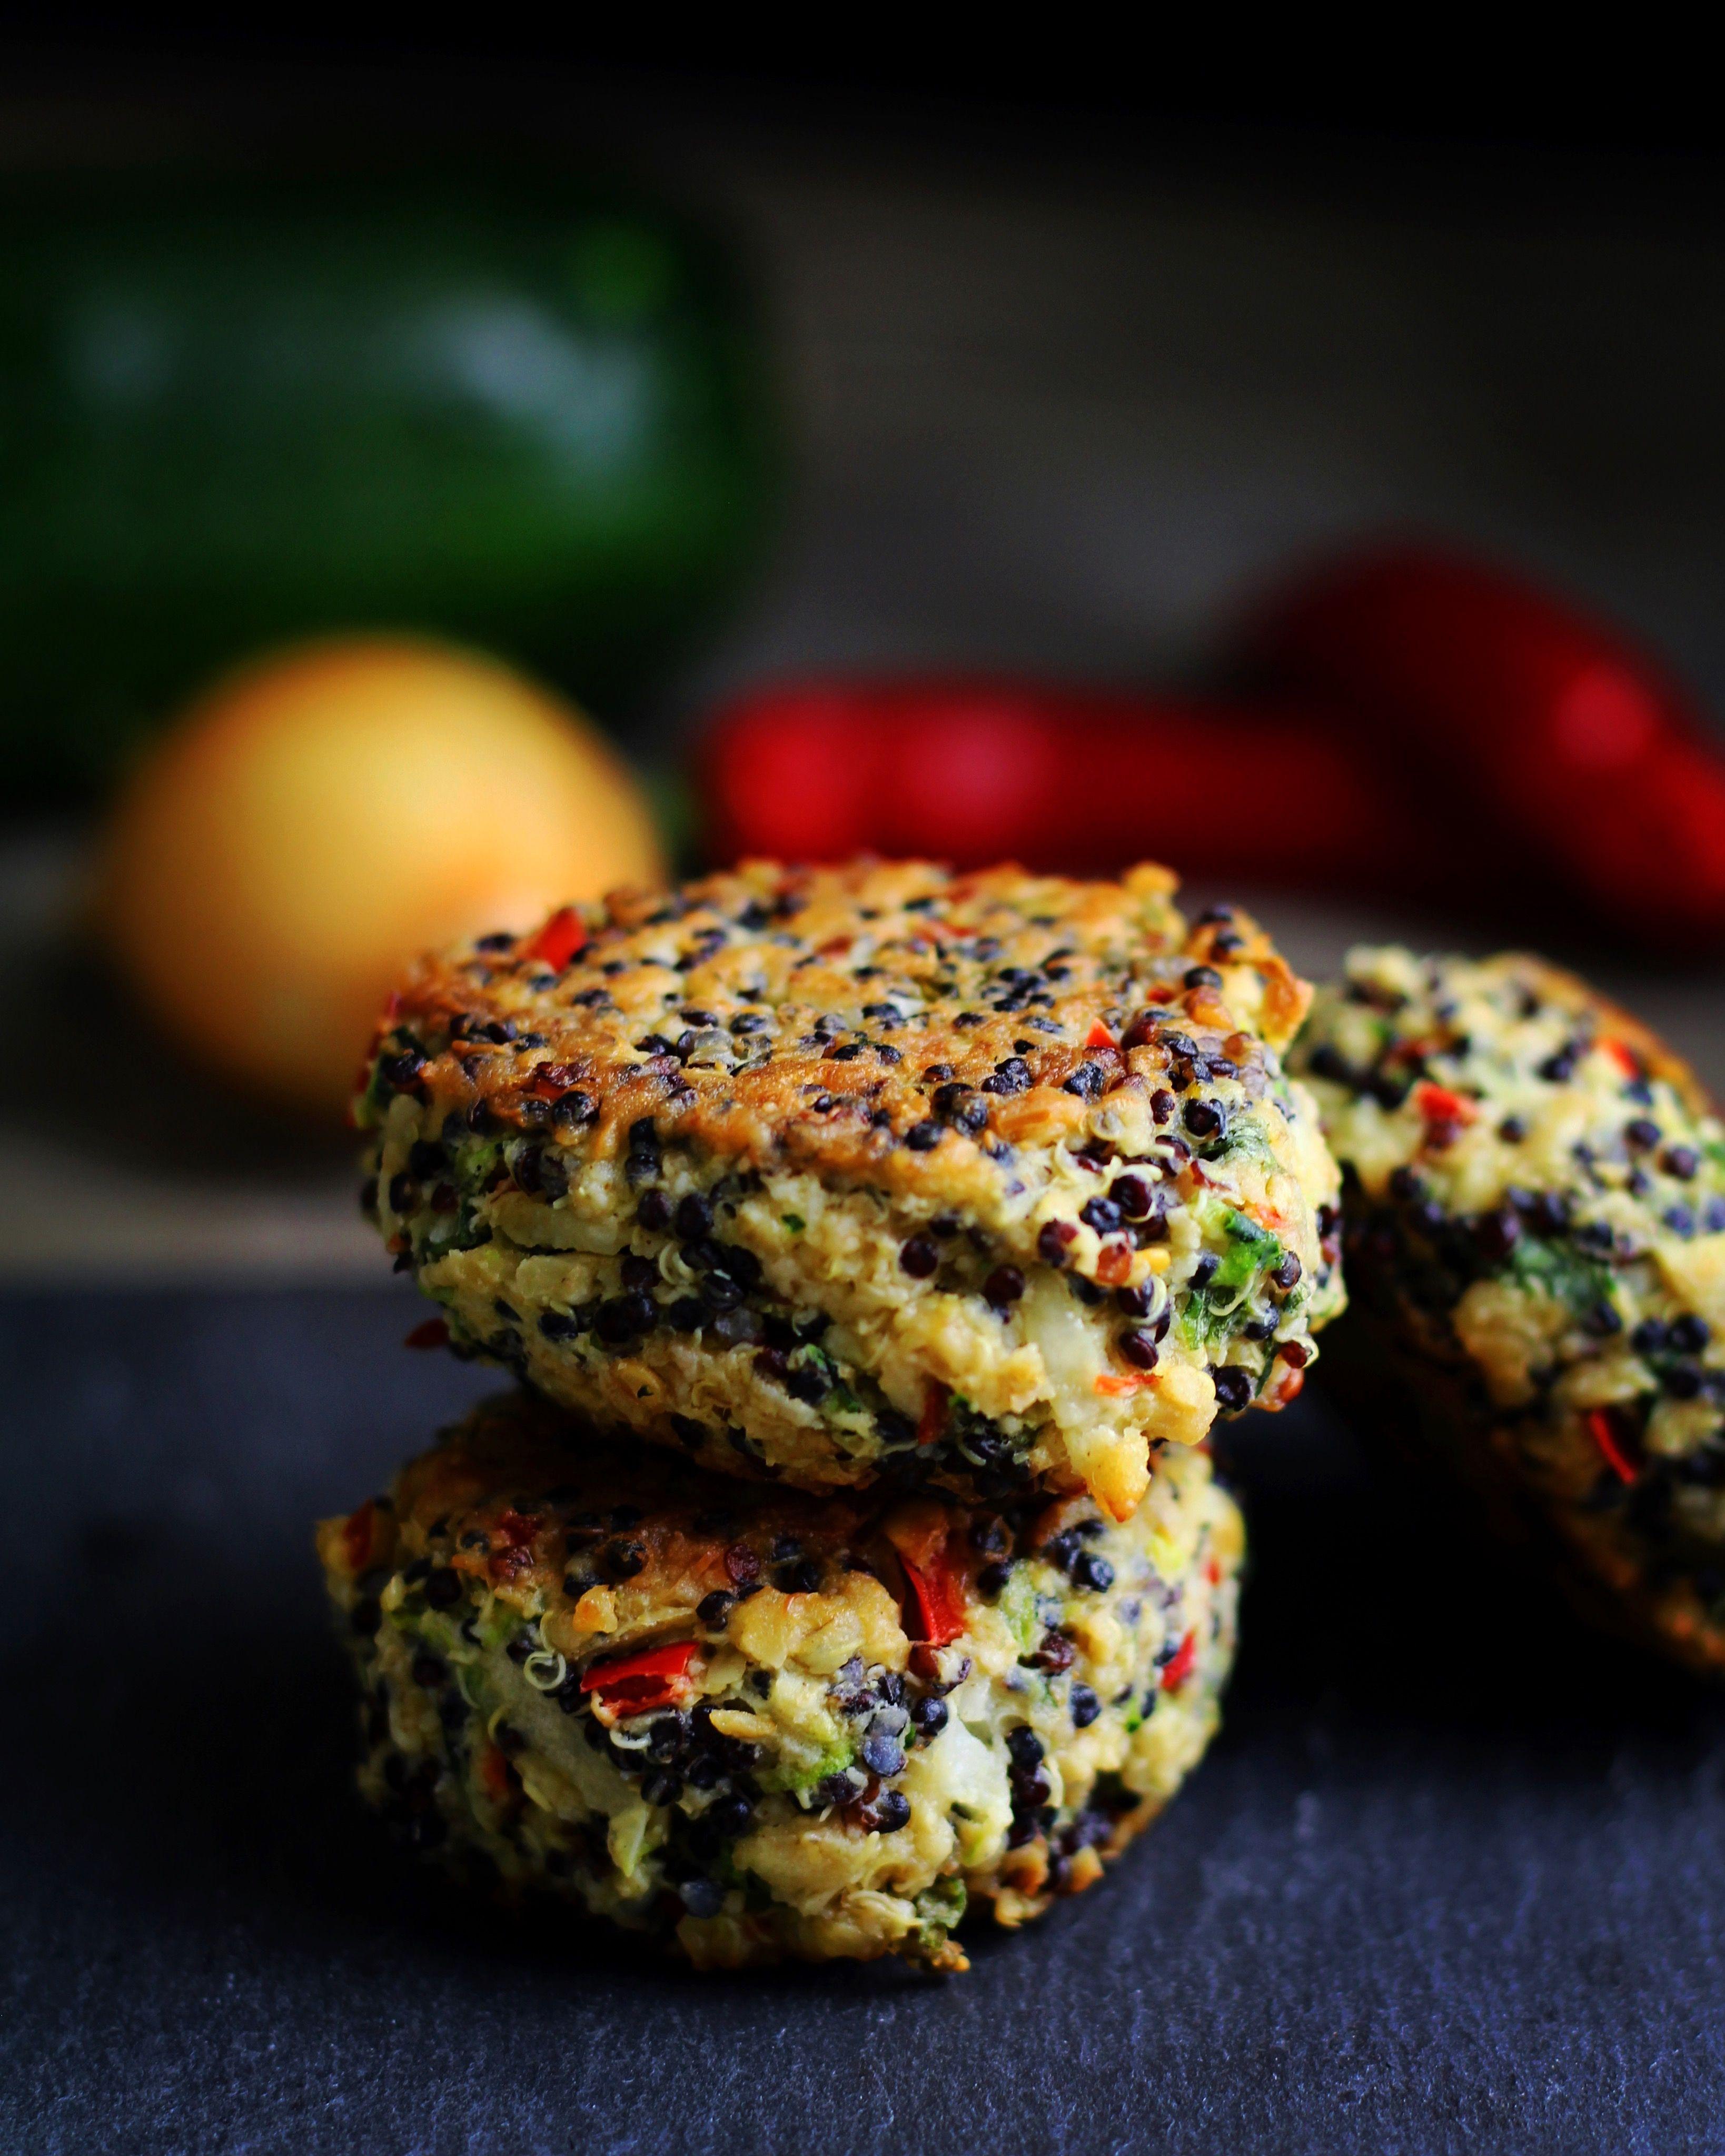 Quinoadeller – Pernille Rosenkilde – sund vegetarmad til krop, sjæl og sanser #slankemadopskrifter